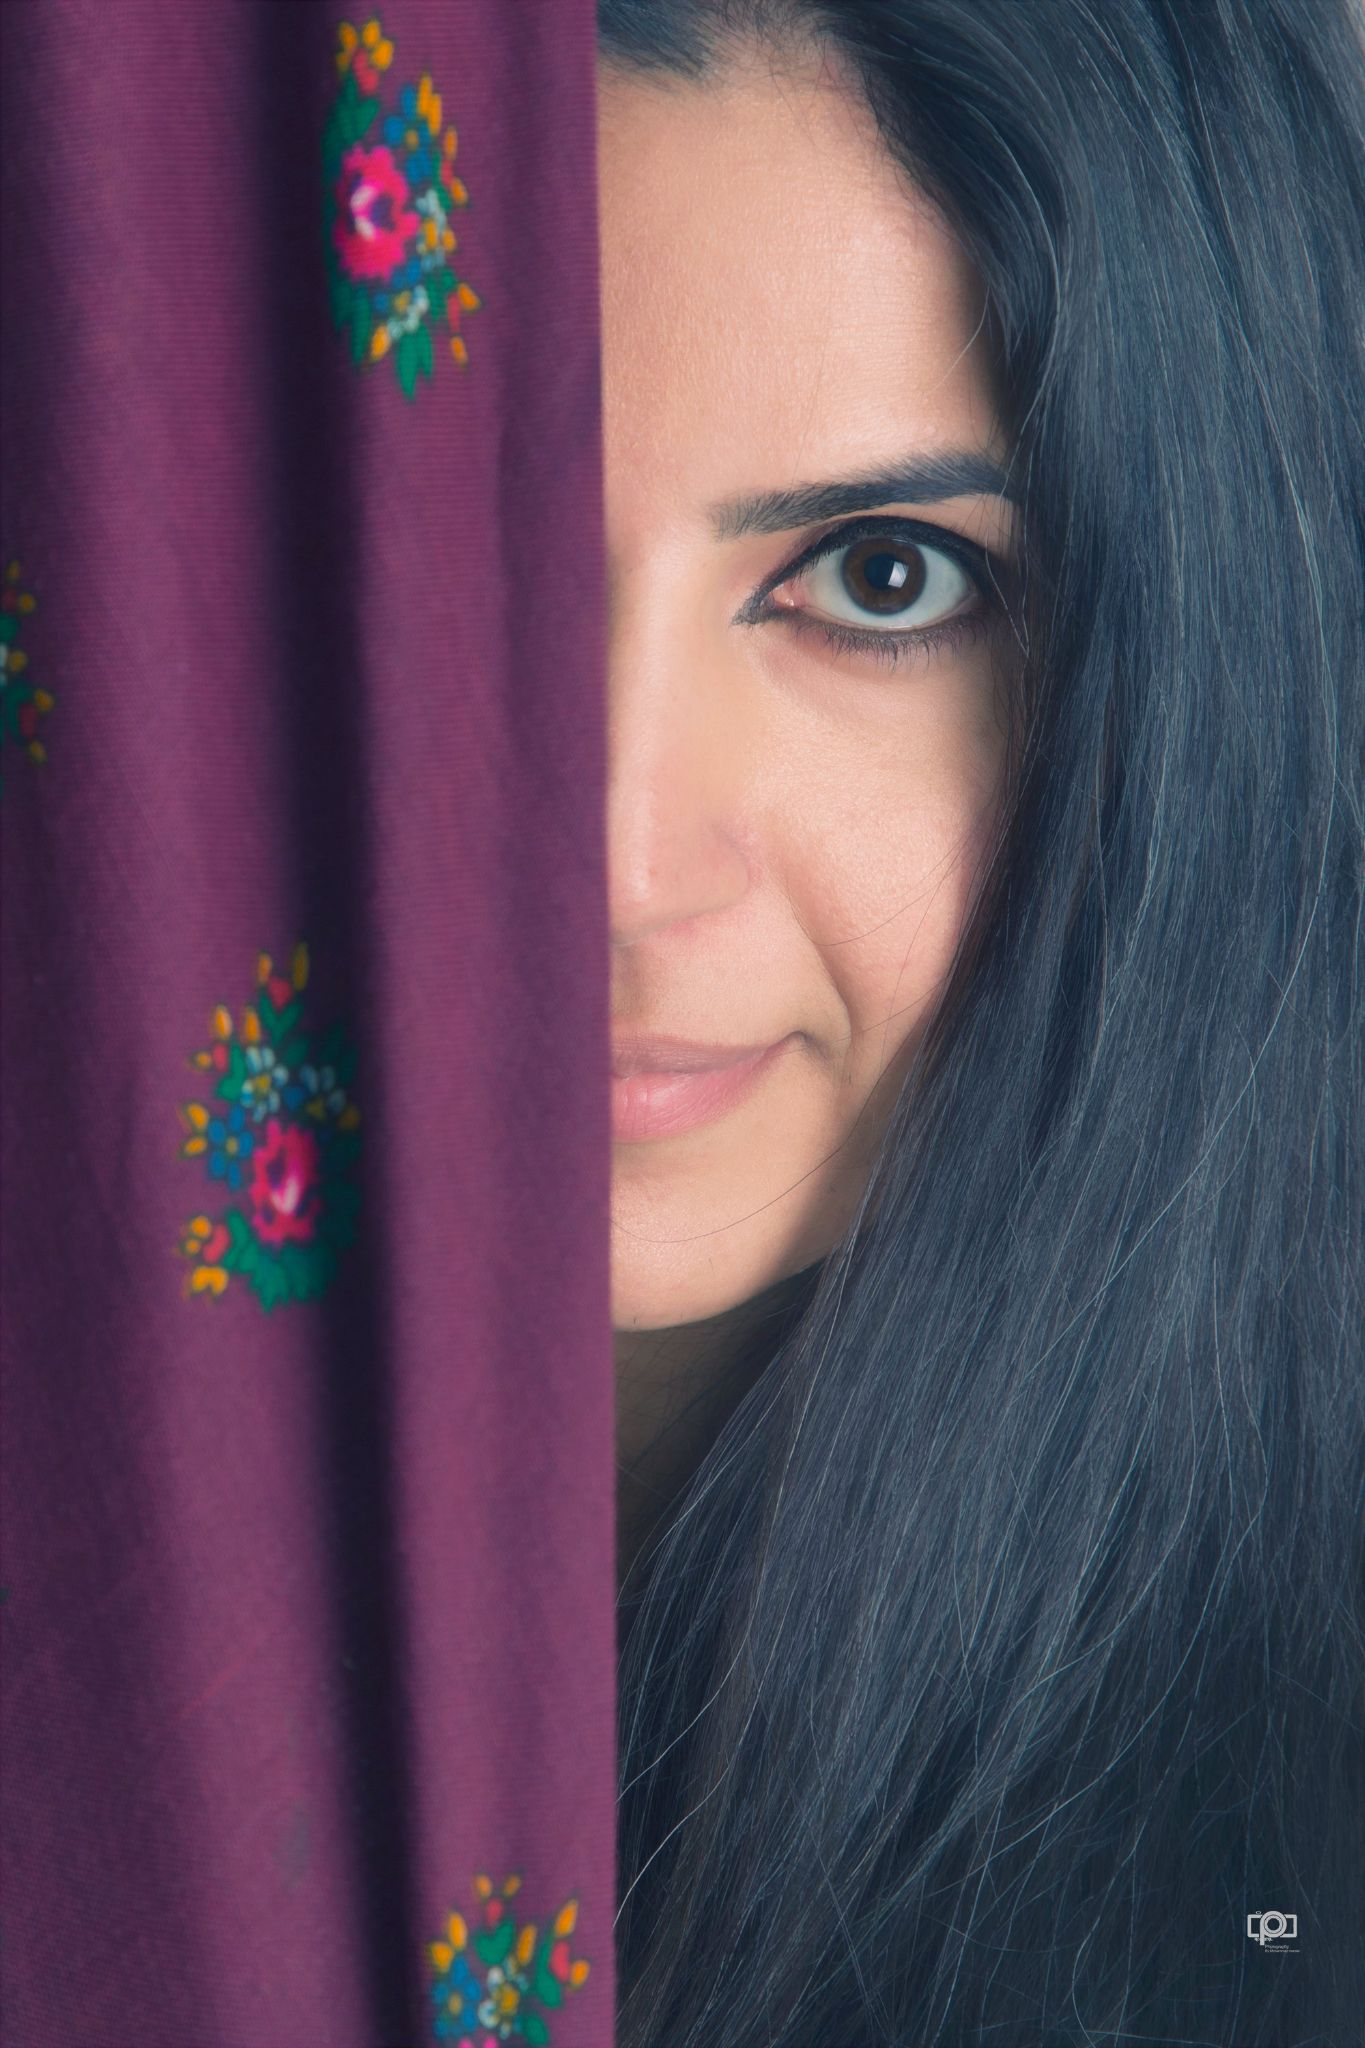 persian girl by mohammad mardan